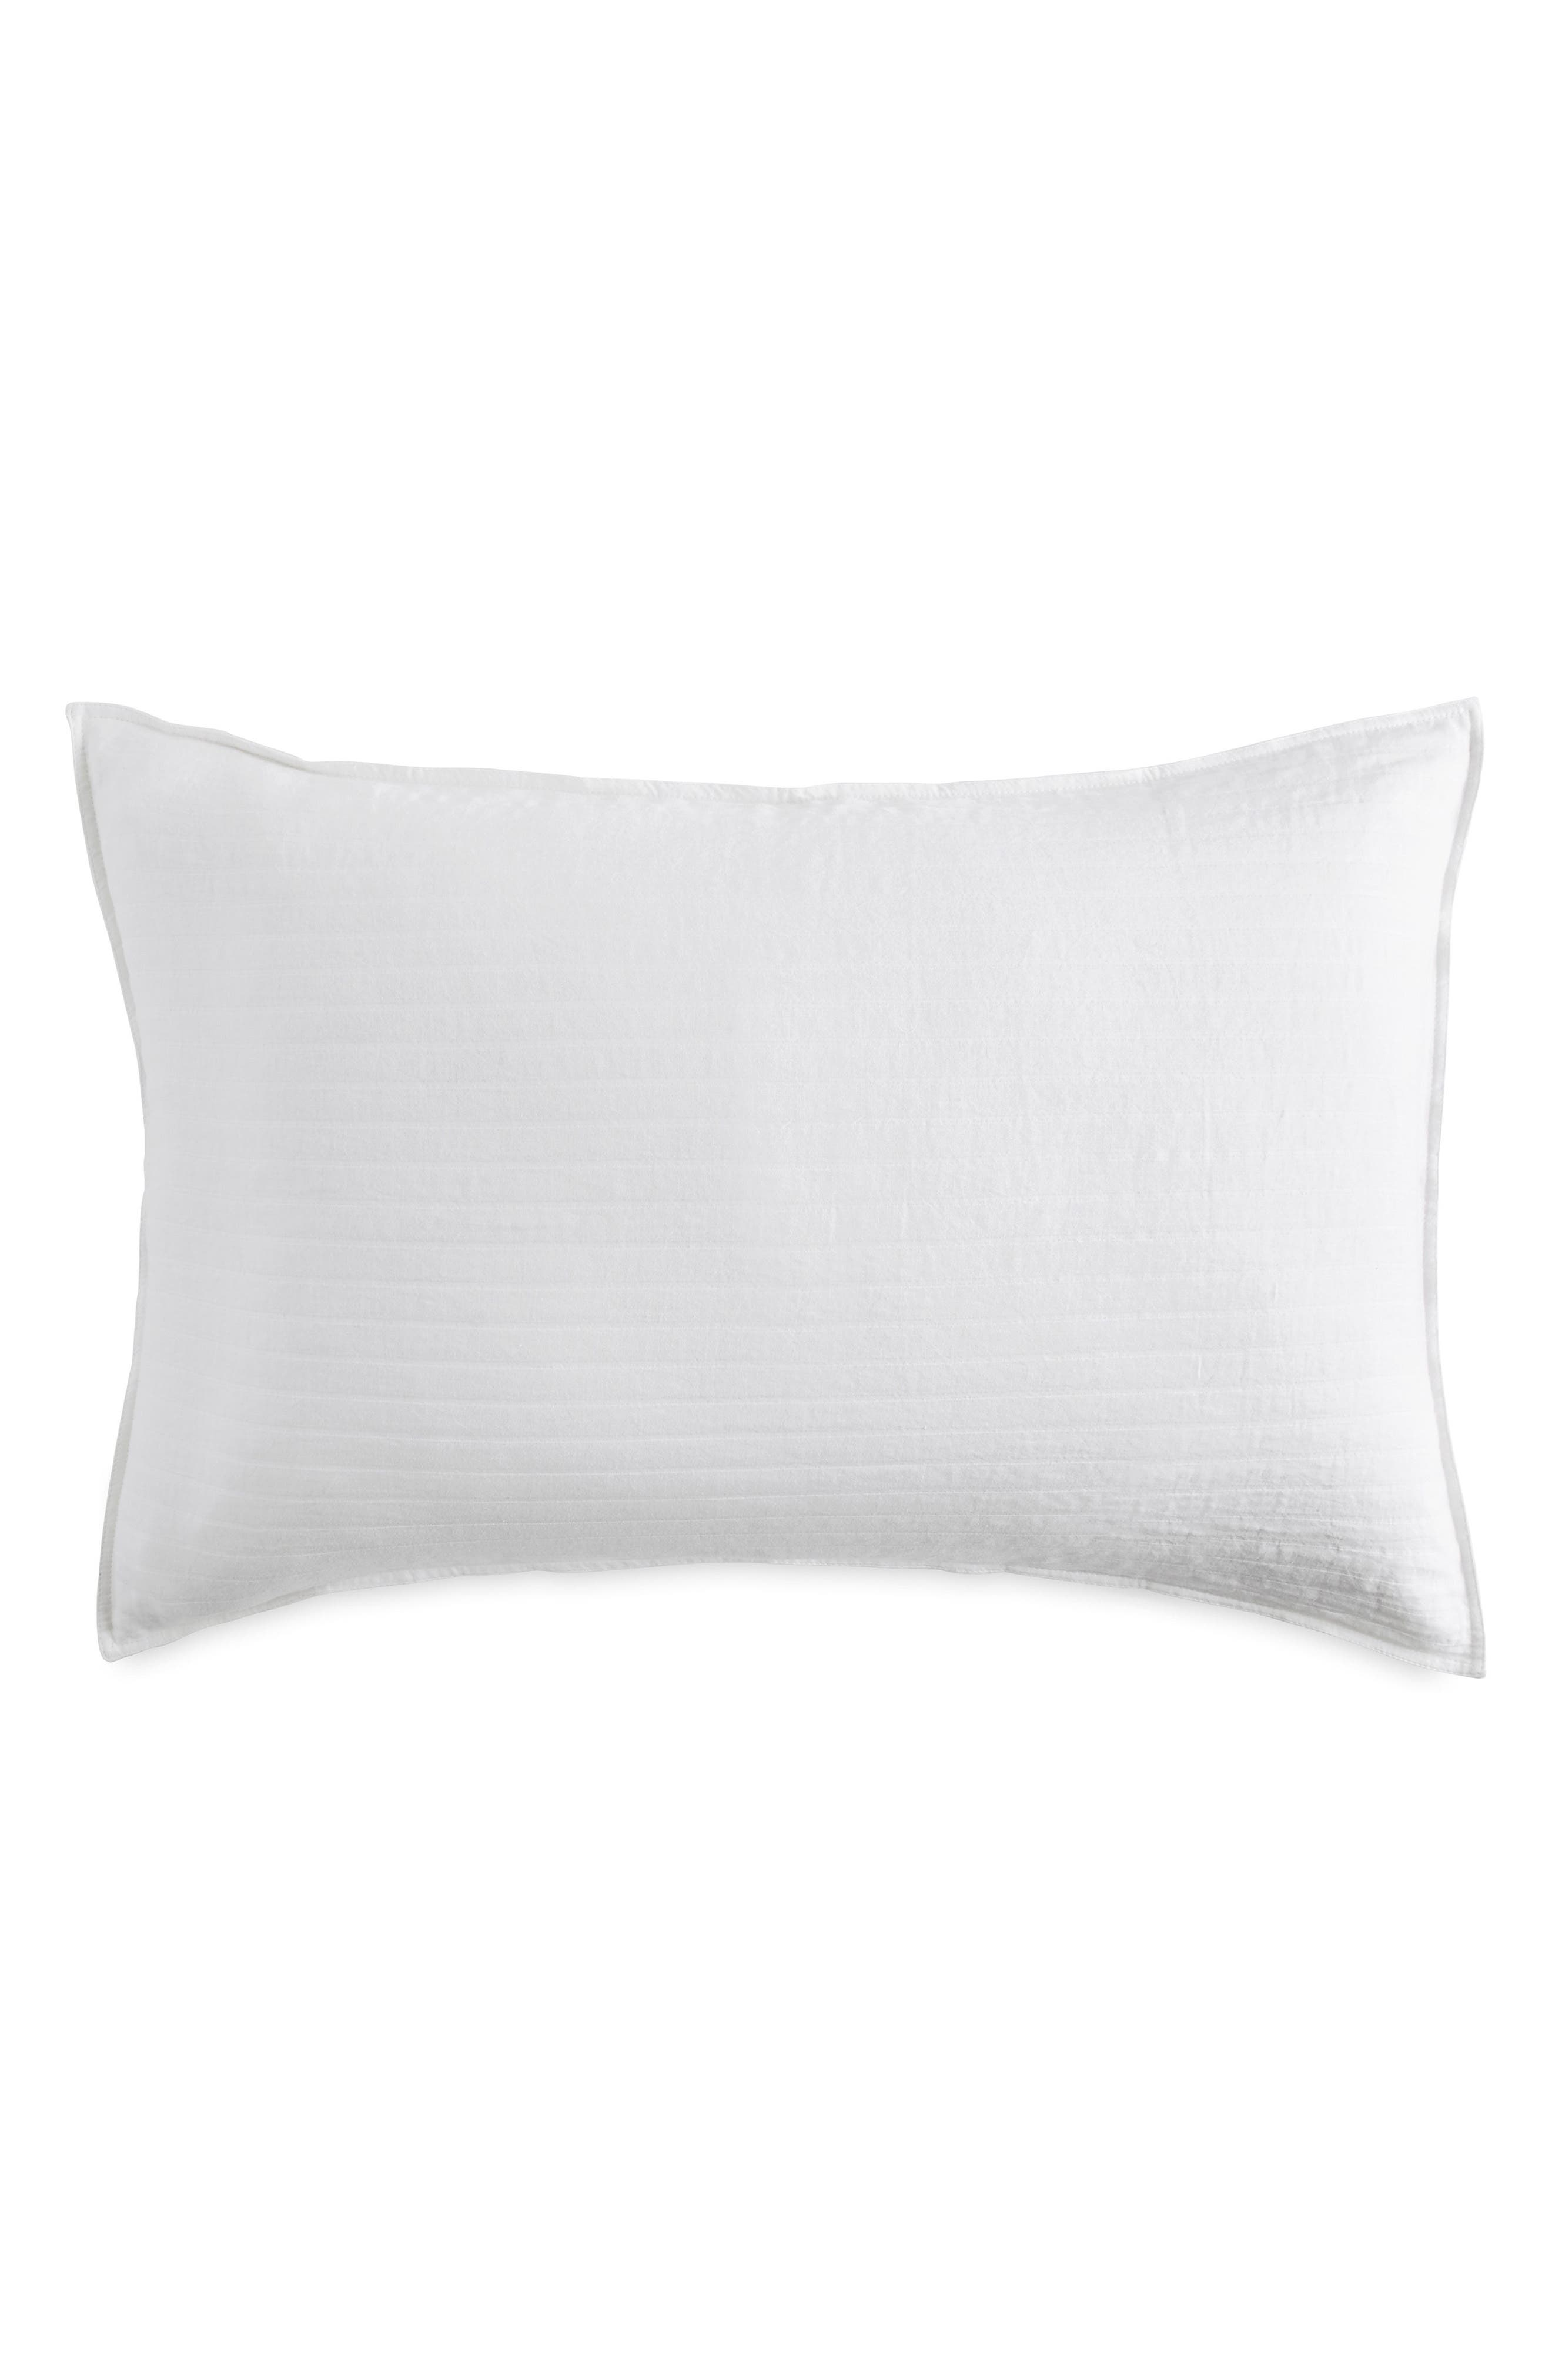 PURE Comfy White Pillow Sham,                             Main thumbnail 1, color,                             WHITE